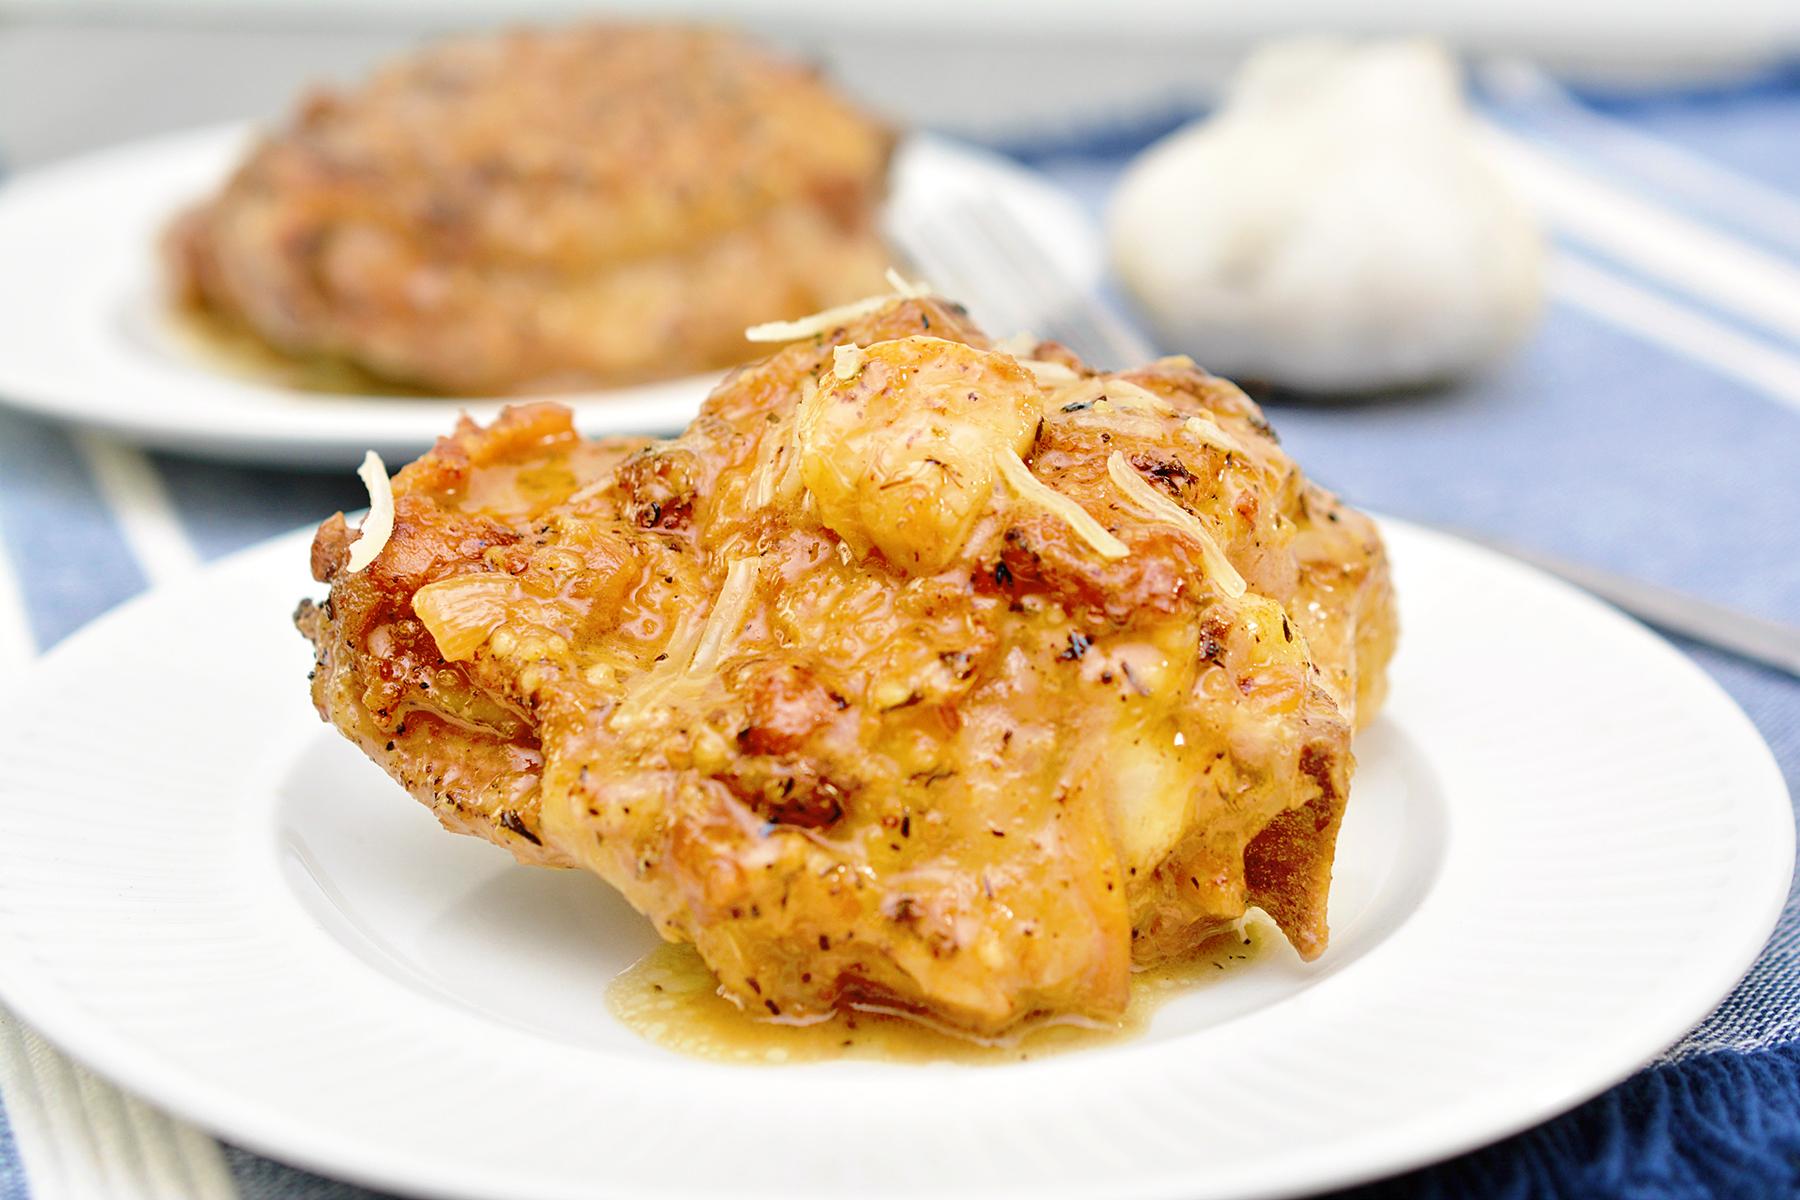 Keto Garlic Roasted Chicken Thighs with Parmesan Gravy